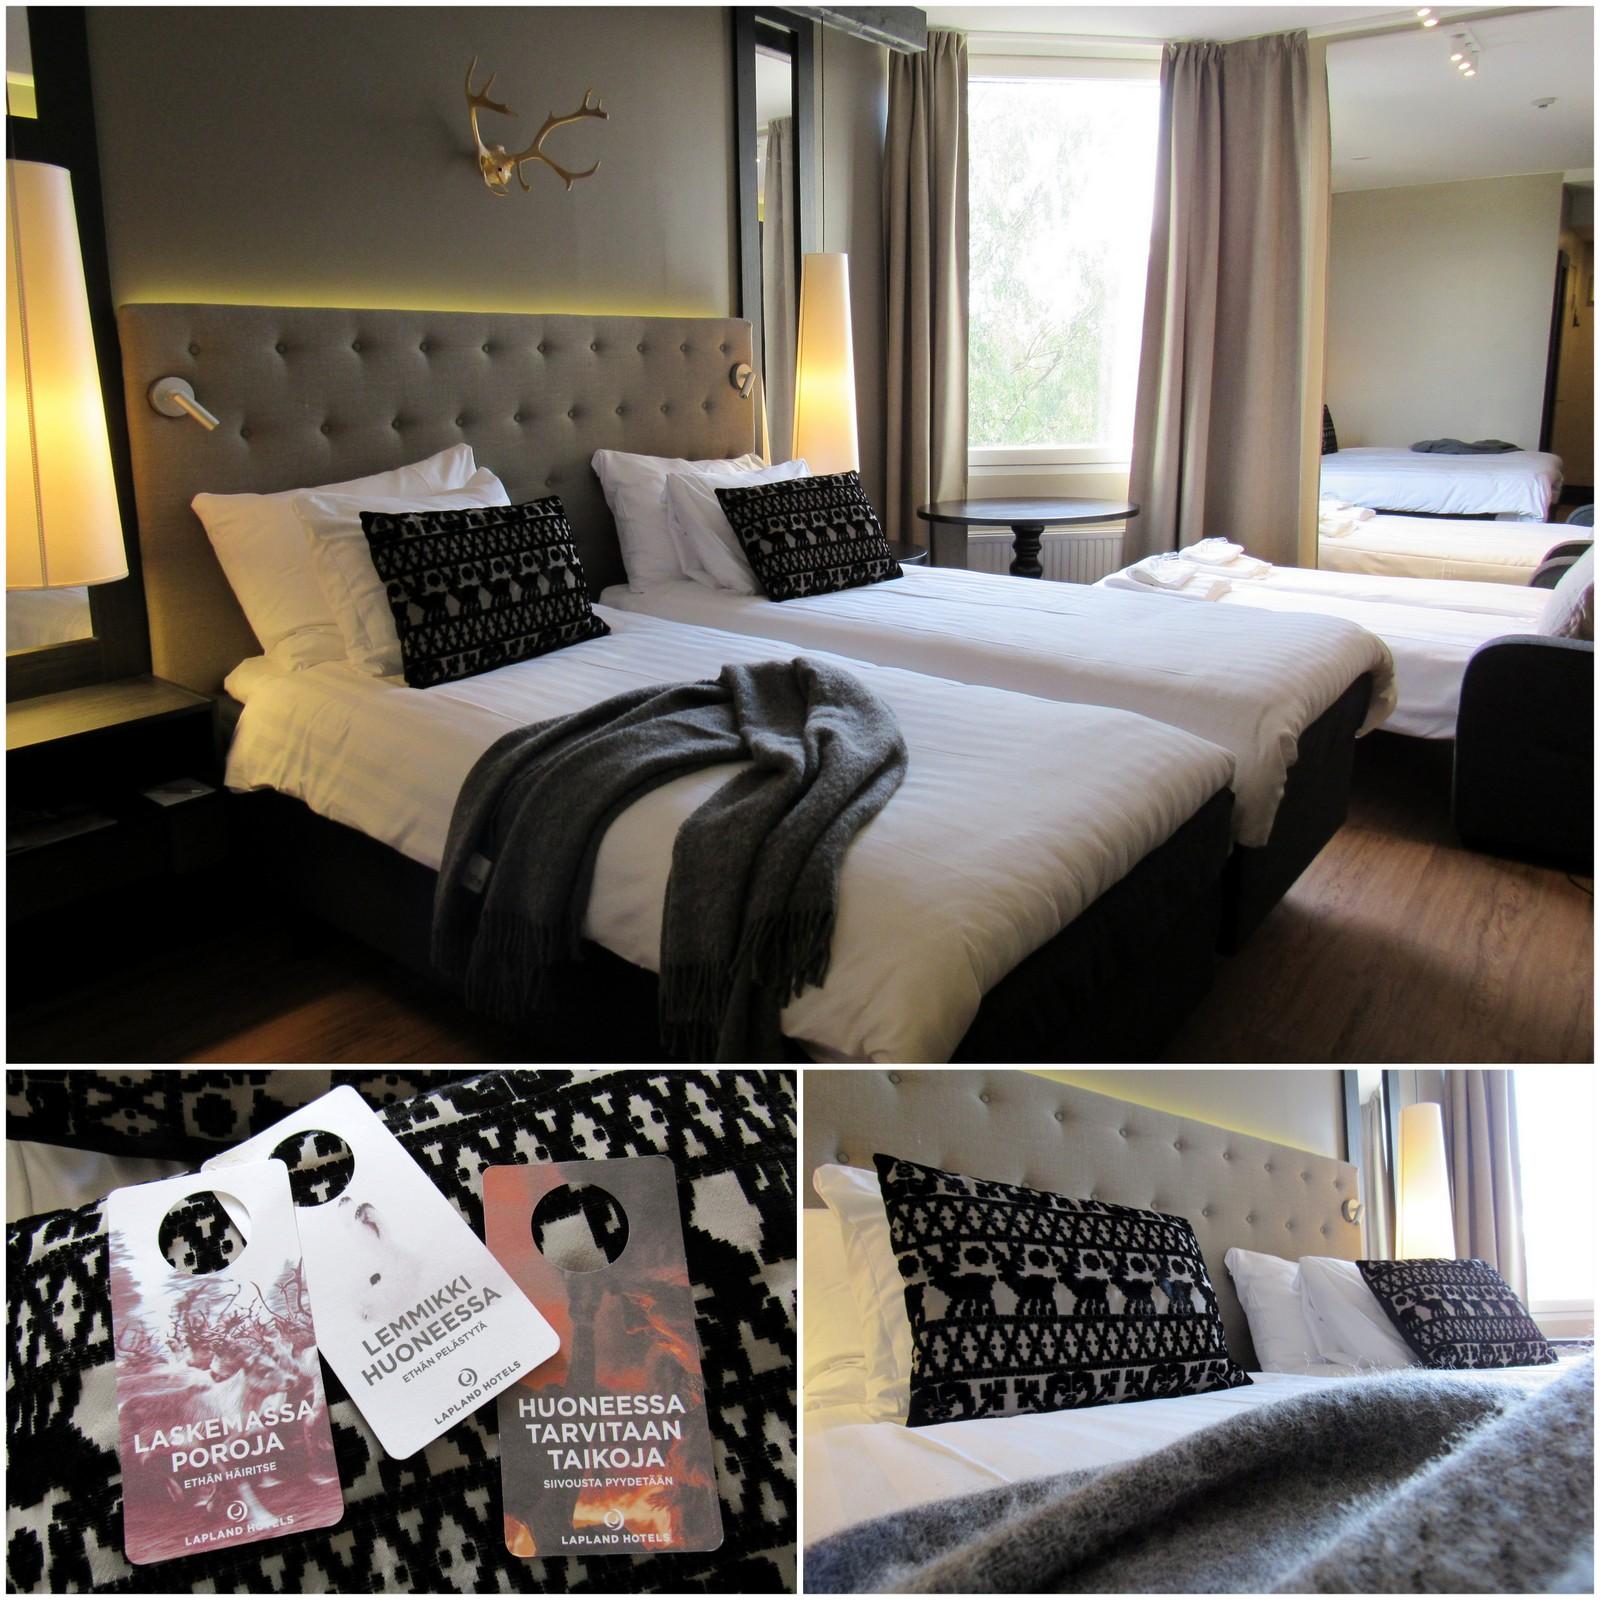 lapland-hotel-oulu-huone